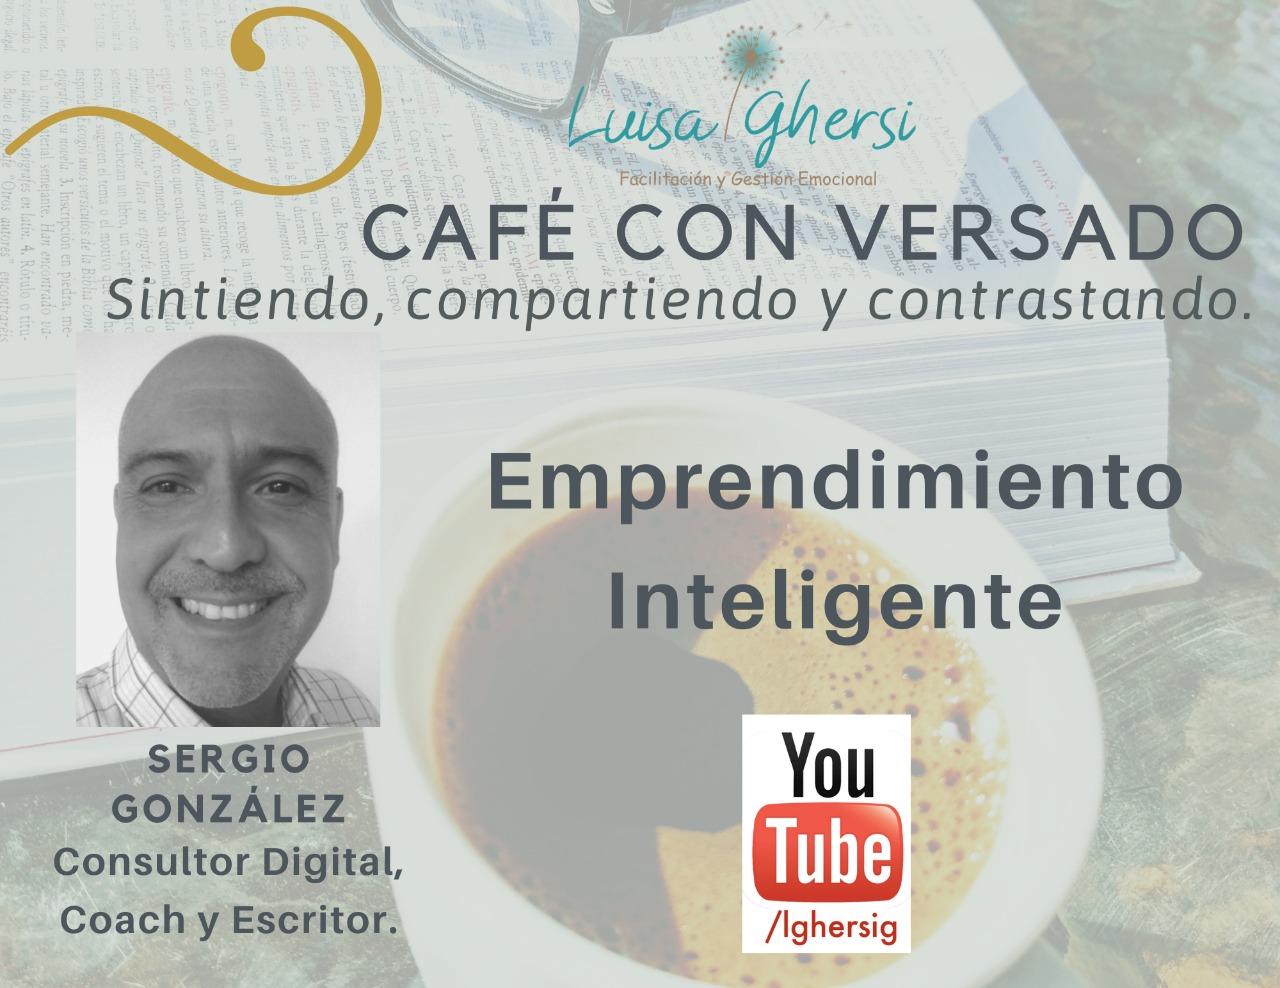 Emprendimiento Inteligente - Entrevista de Luisa Ghersi a Sergio González - Overflow.pe